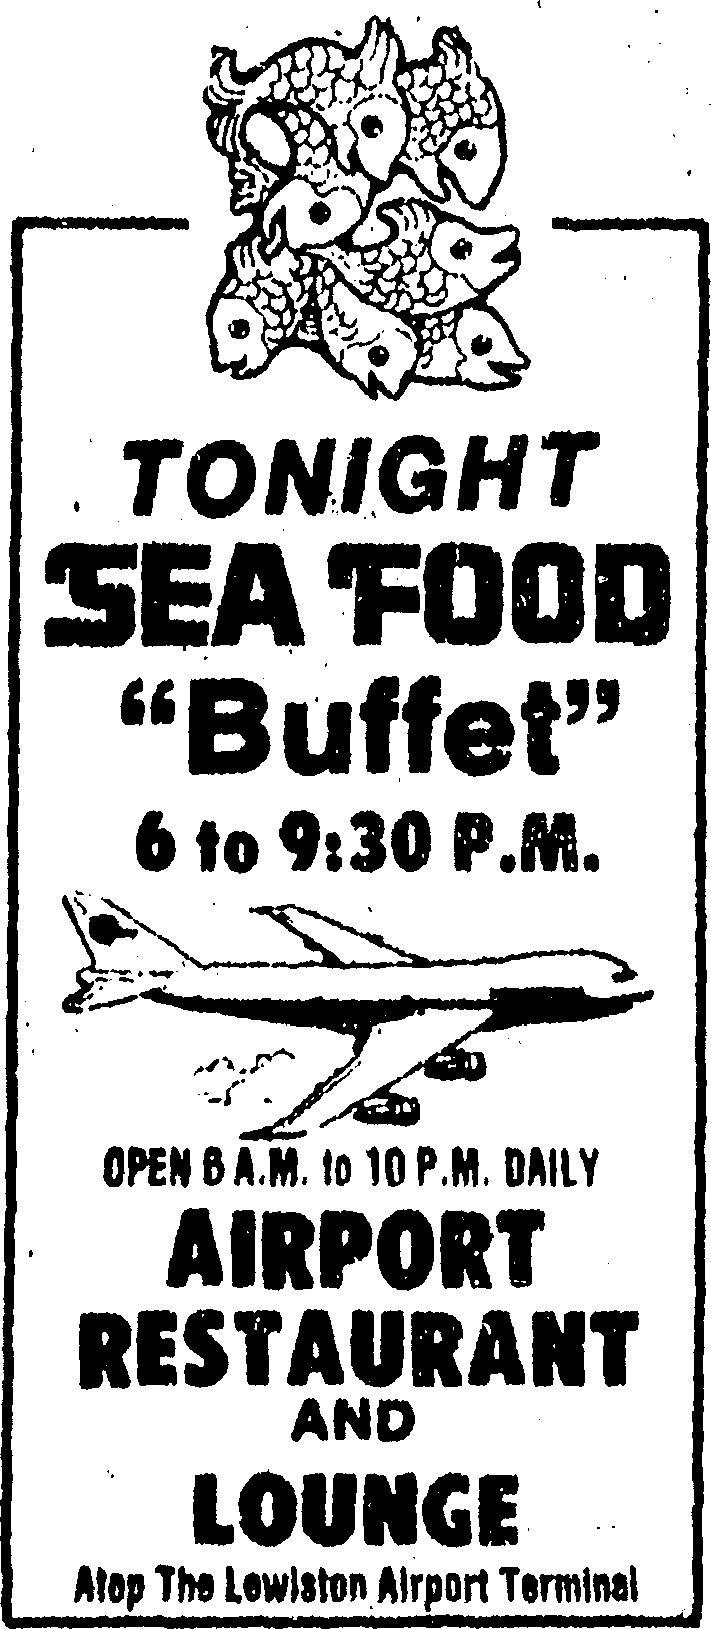 FB 05041979 Airport restaurant.jpg